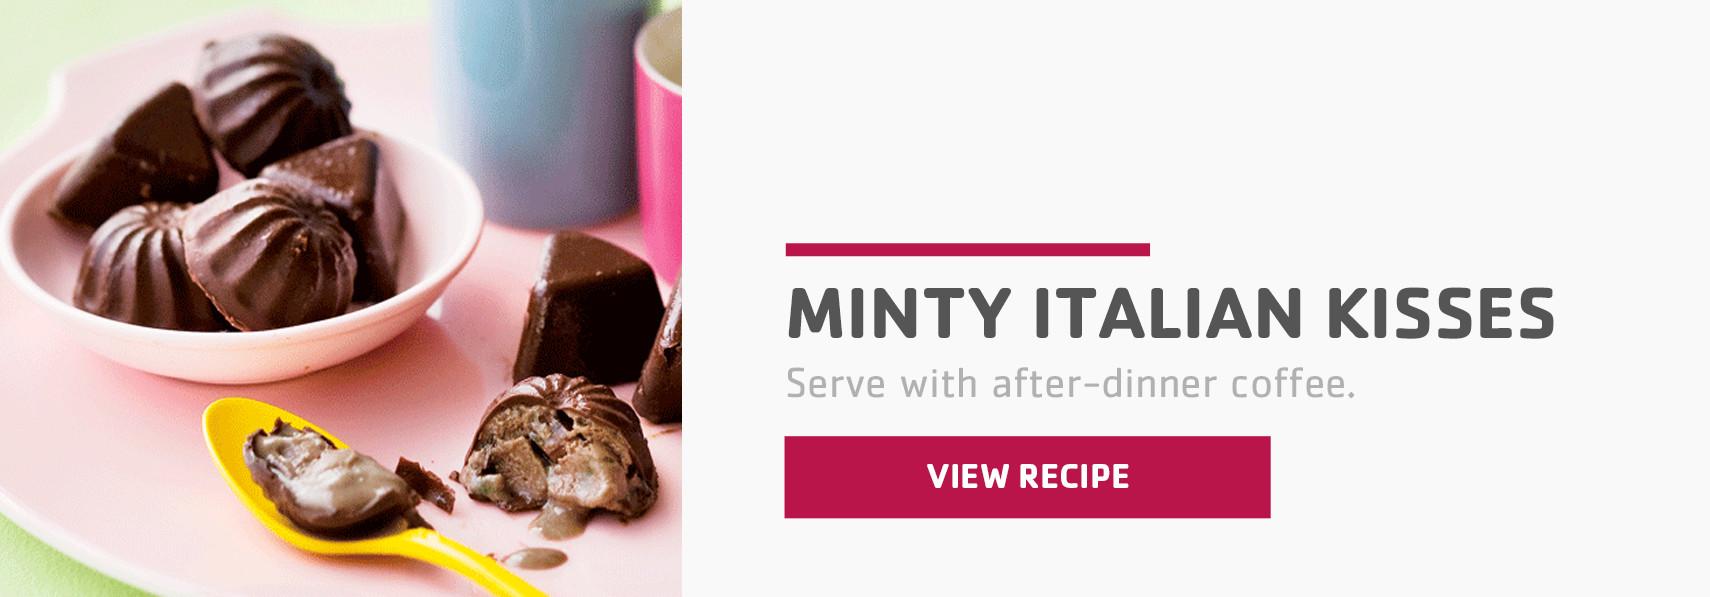 minty-italian-kisses.jpg